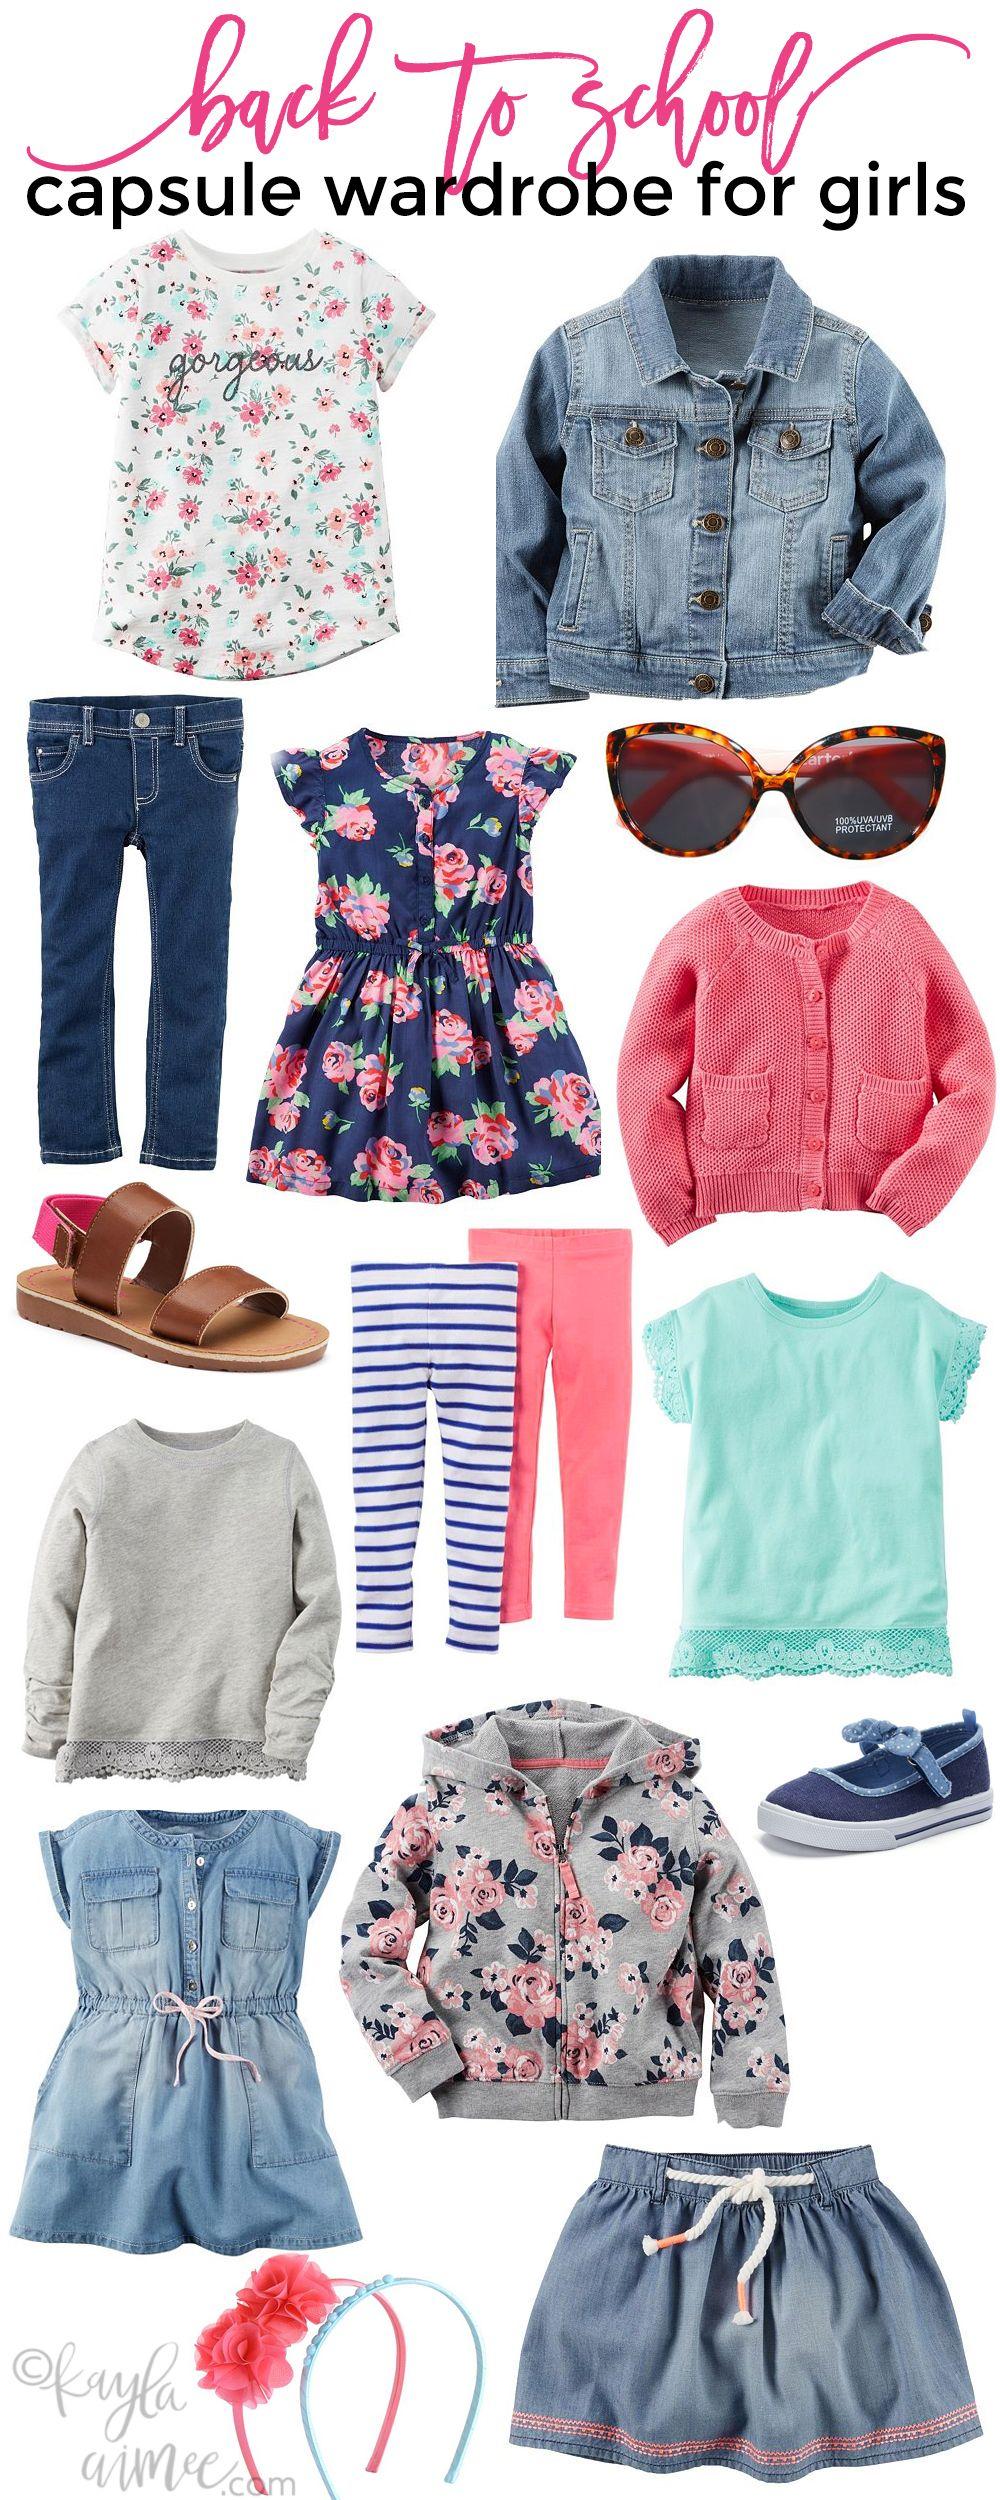 7e66721f7 Back To School  Capsule Wardrobe For Girls